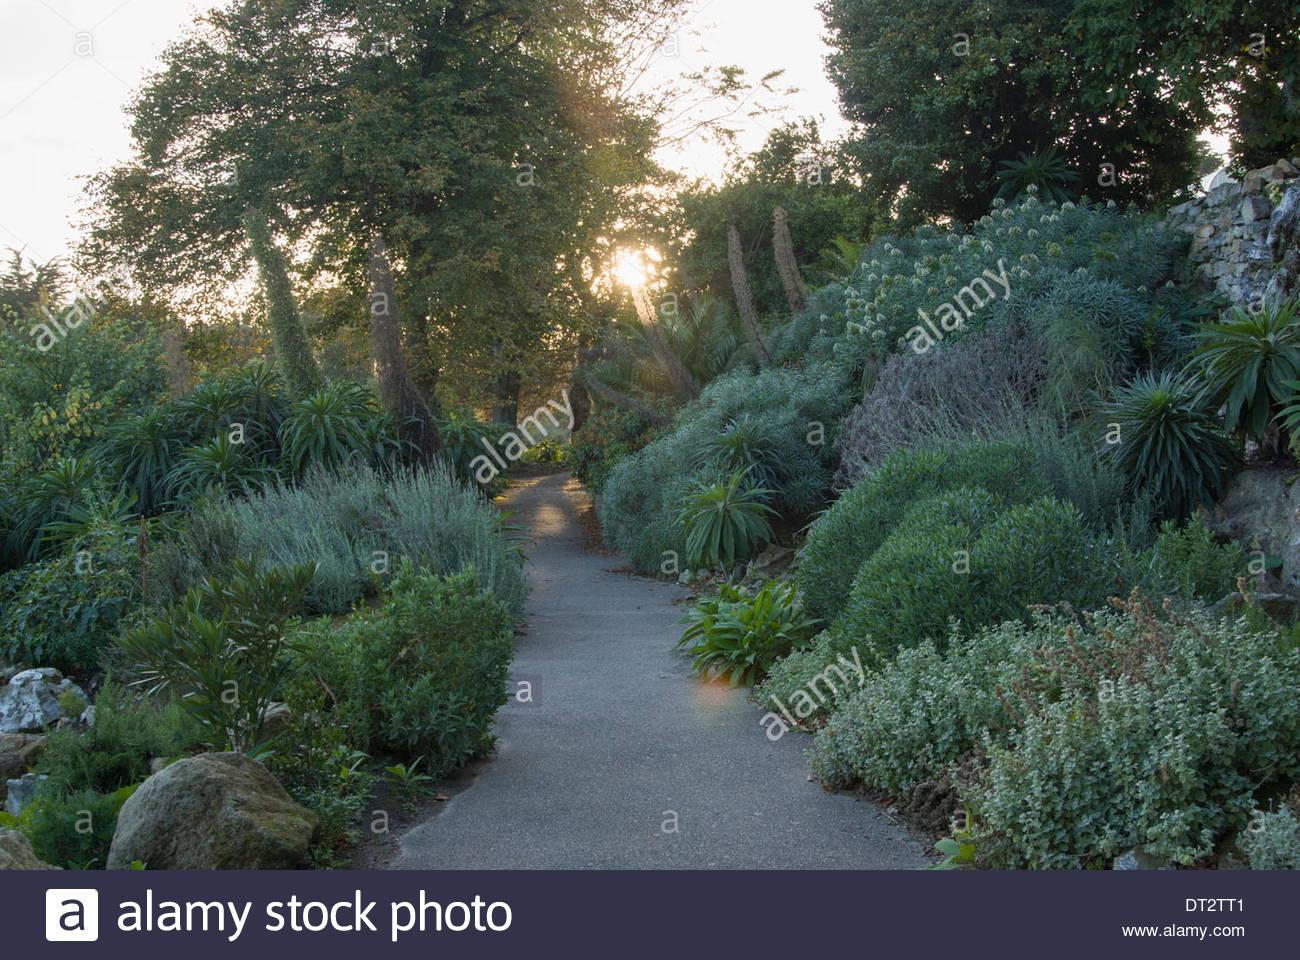 ventnor botanic garden stock photos & ventnor botanic garden stock, Garten und erstellen